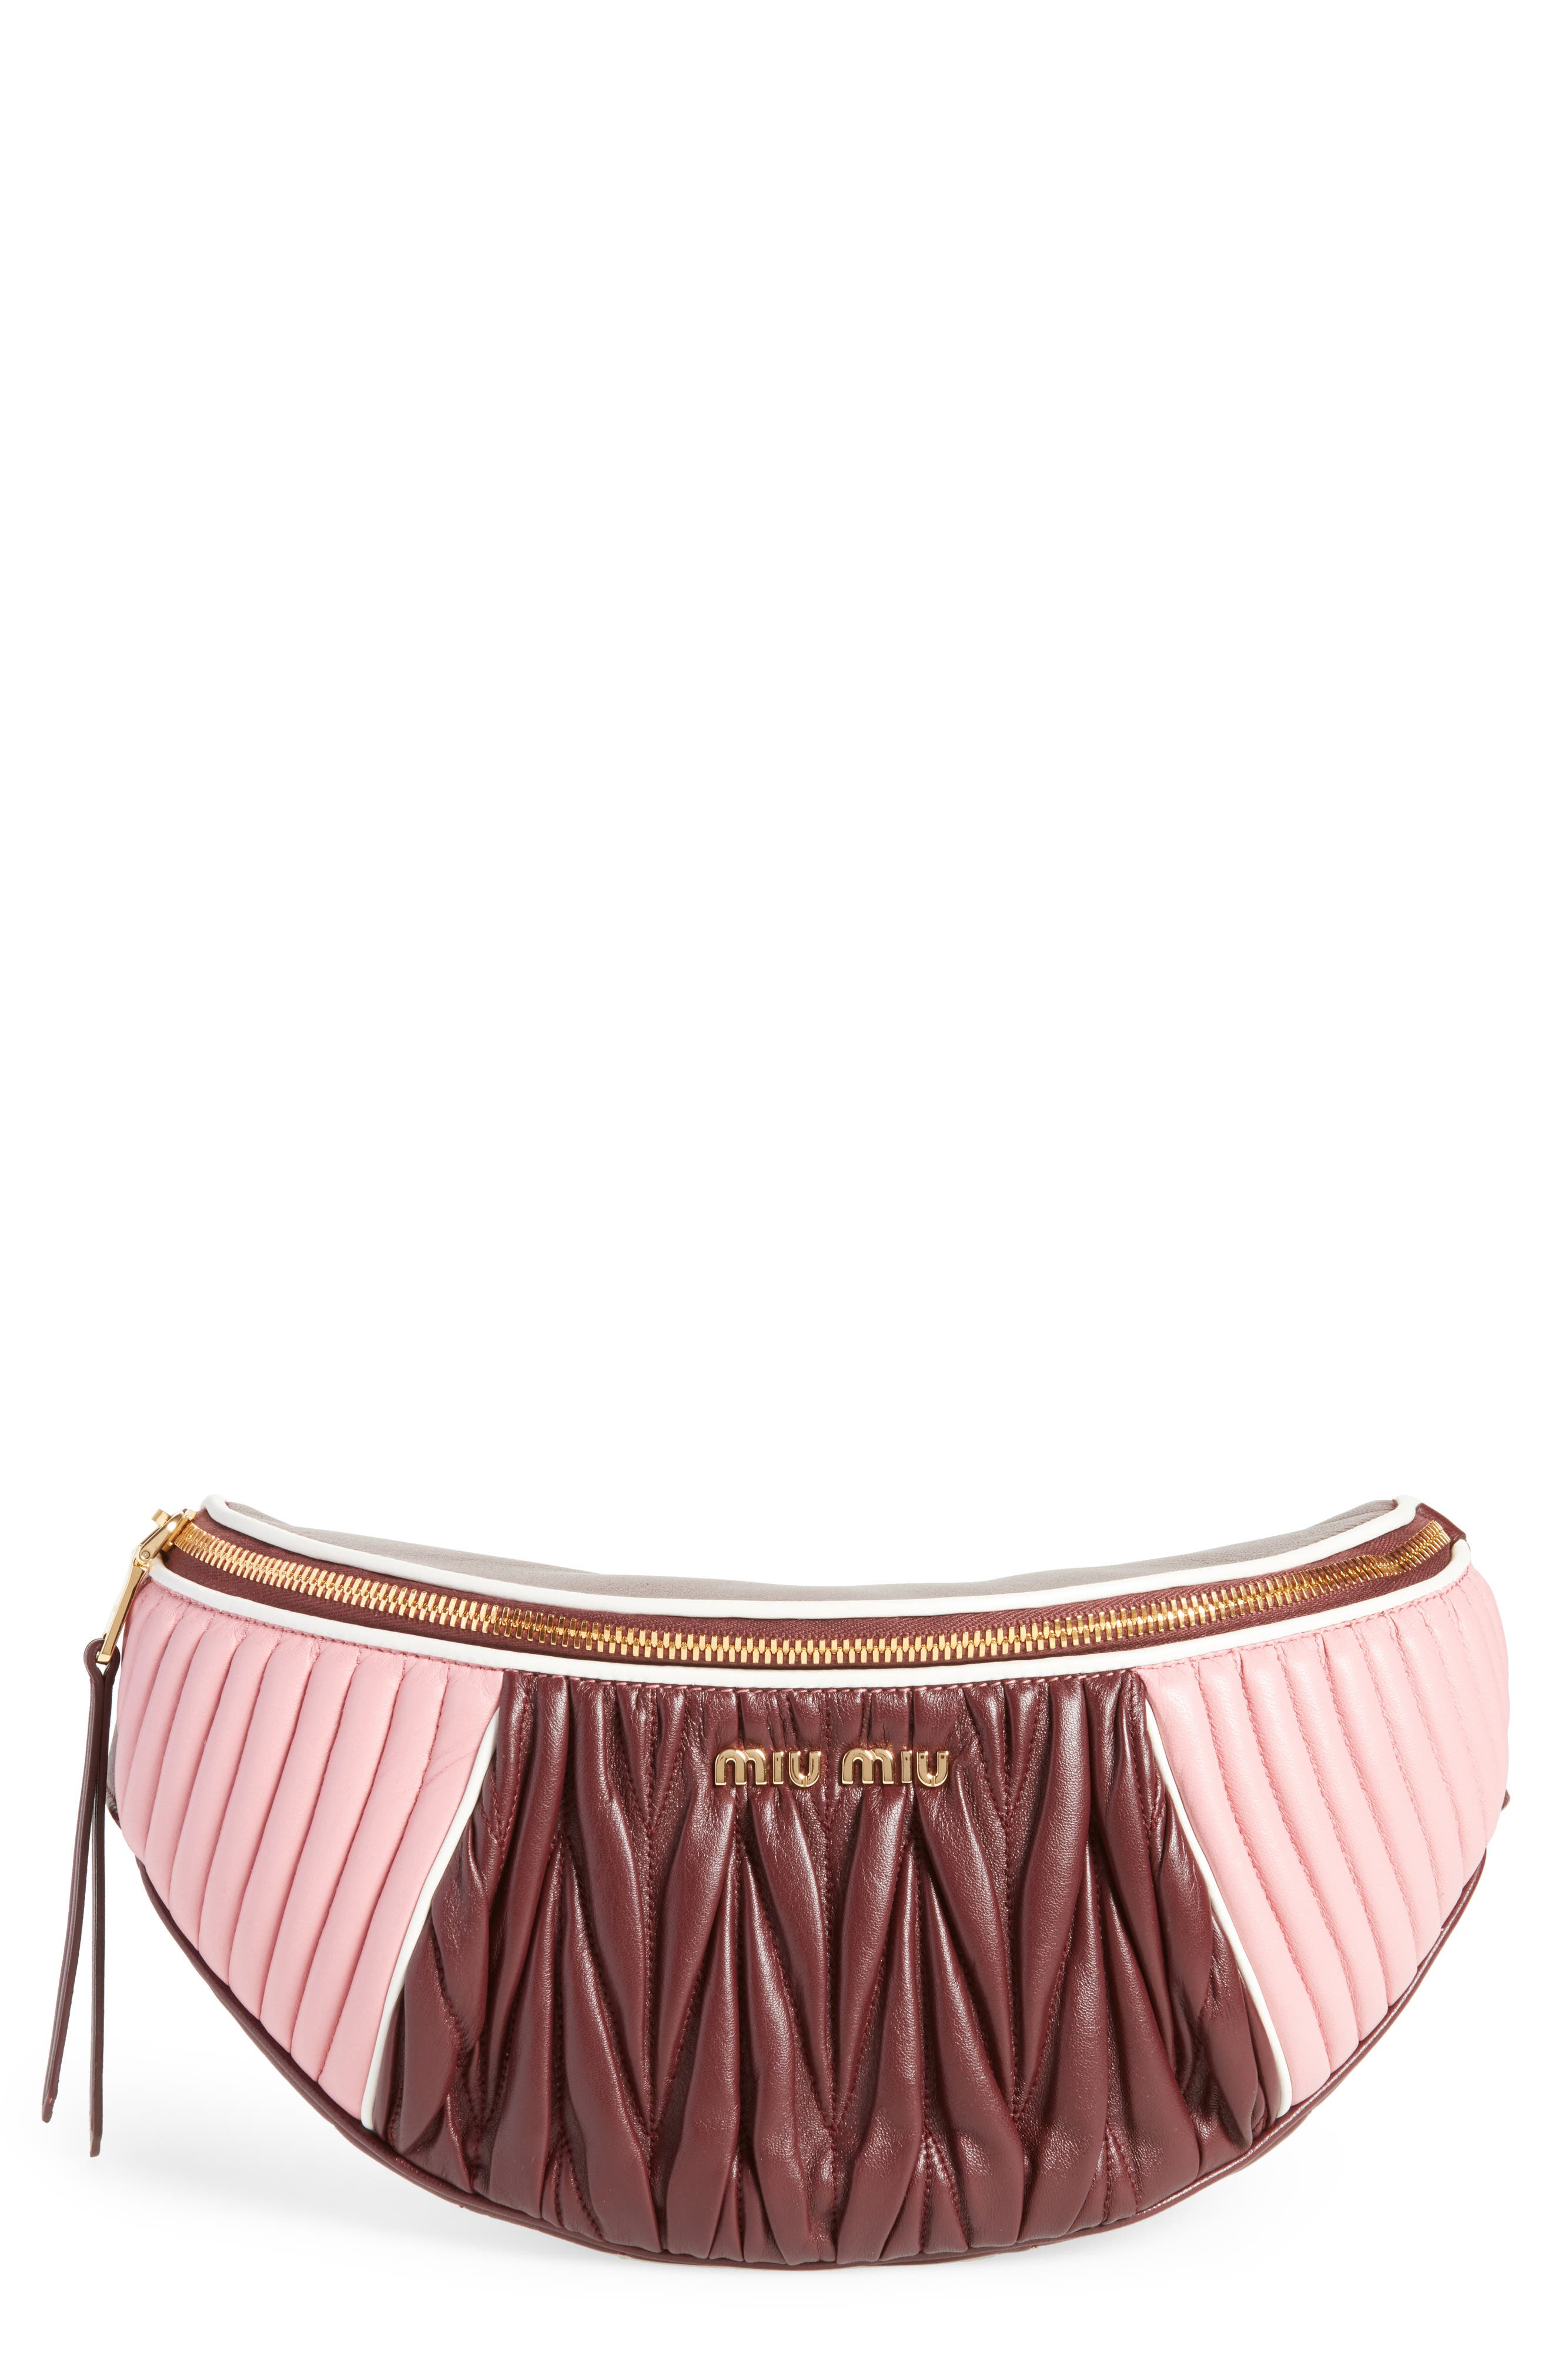 Main Image - Miu Miu Rider Matelassé Leather Belt Bag